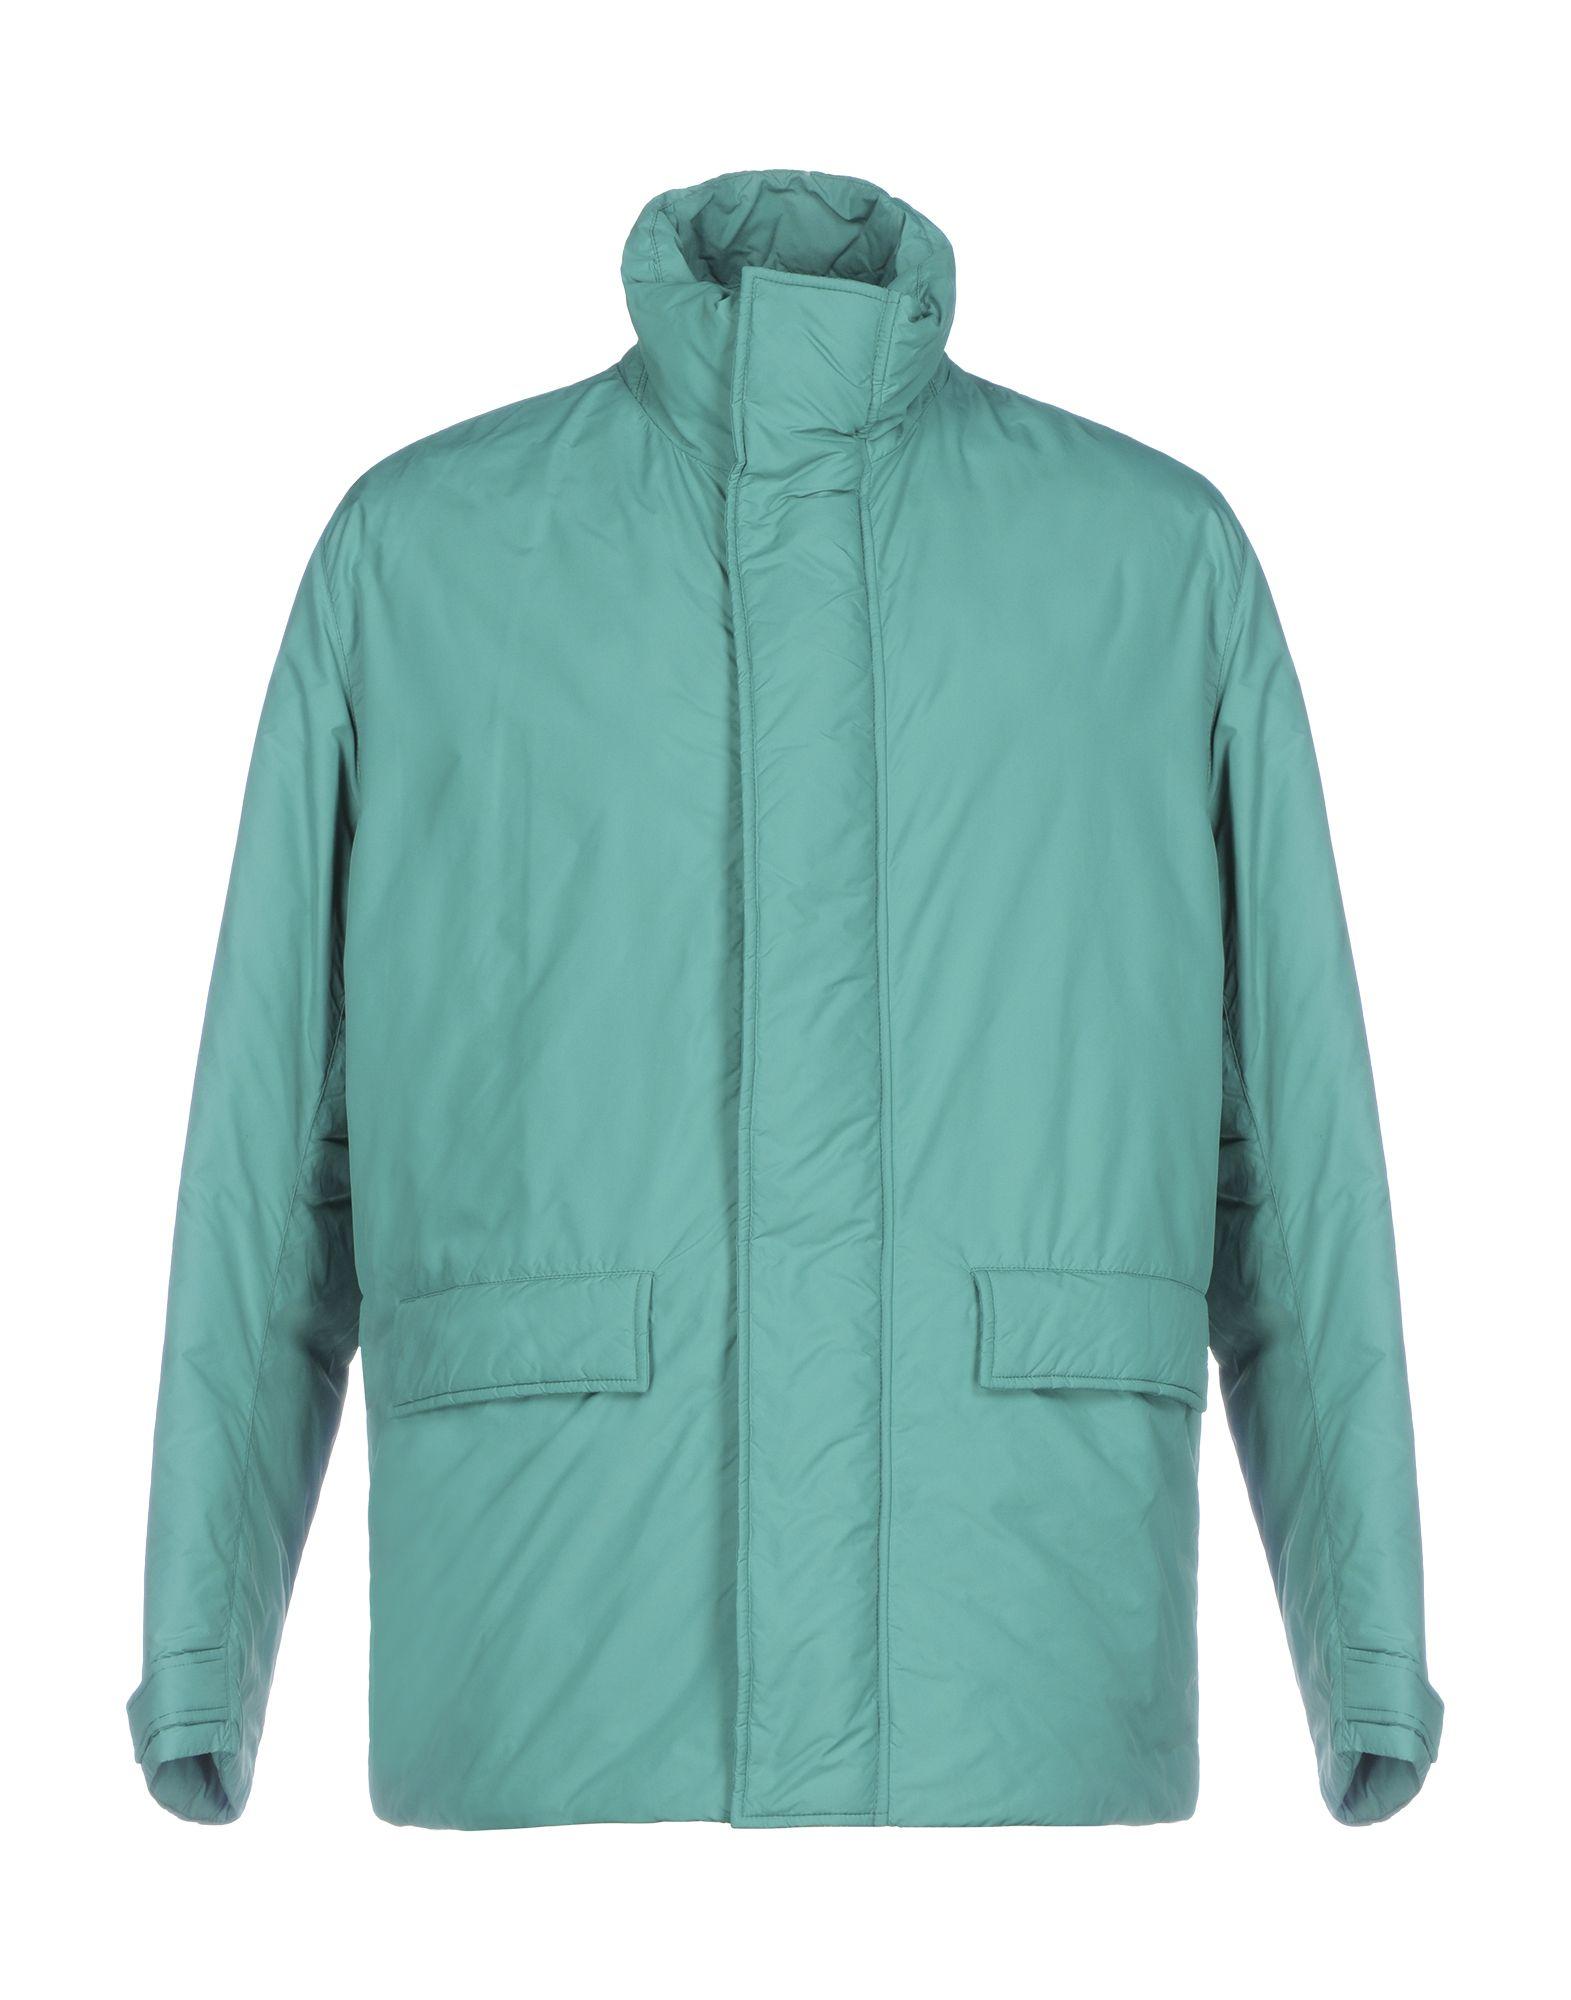 COLMAR ORIGINALS Down Jacket in Green